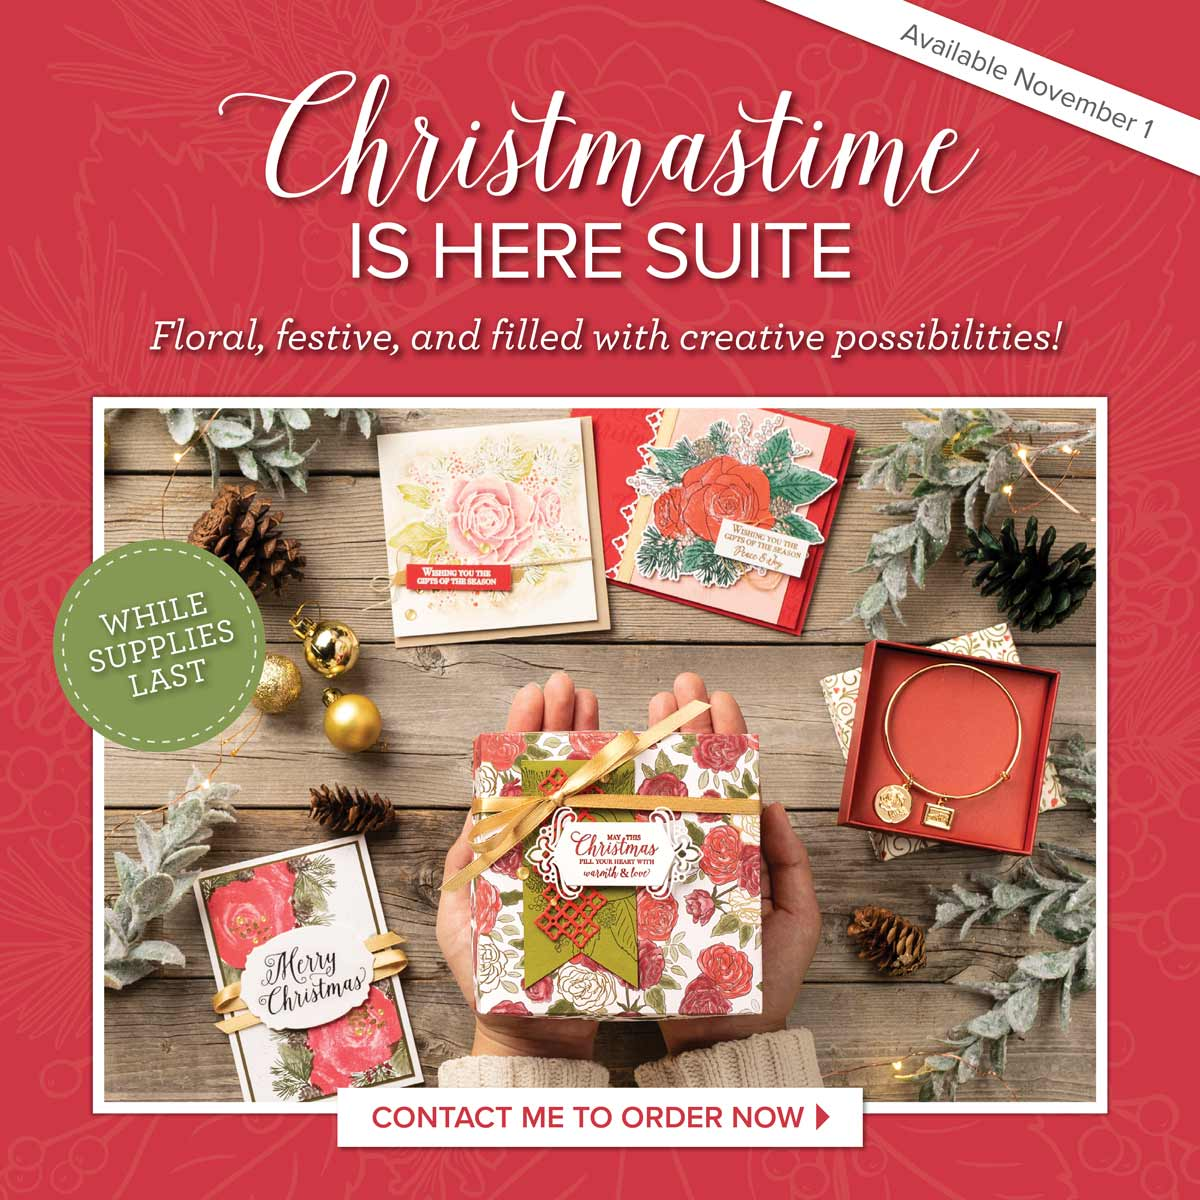 Christmastime is HereSuite